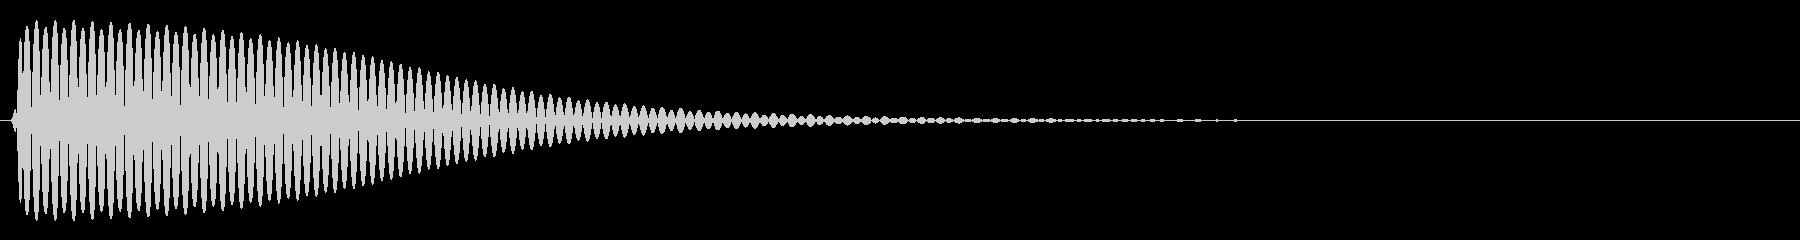 Com ファミコンなどのコマンド音 8の未再生の波形